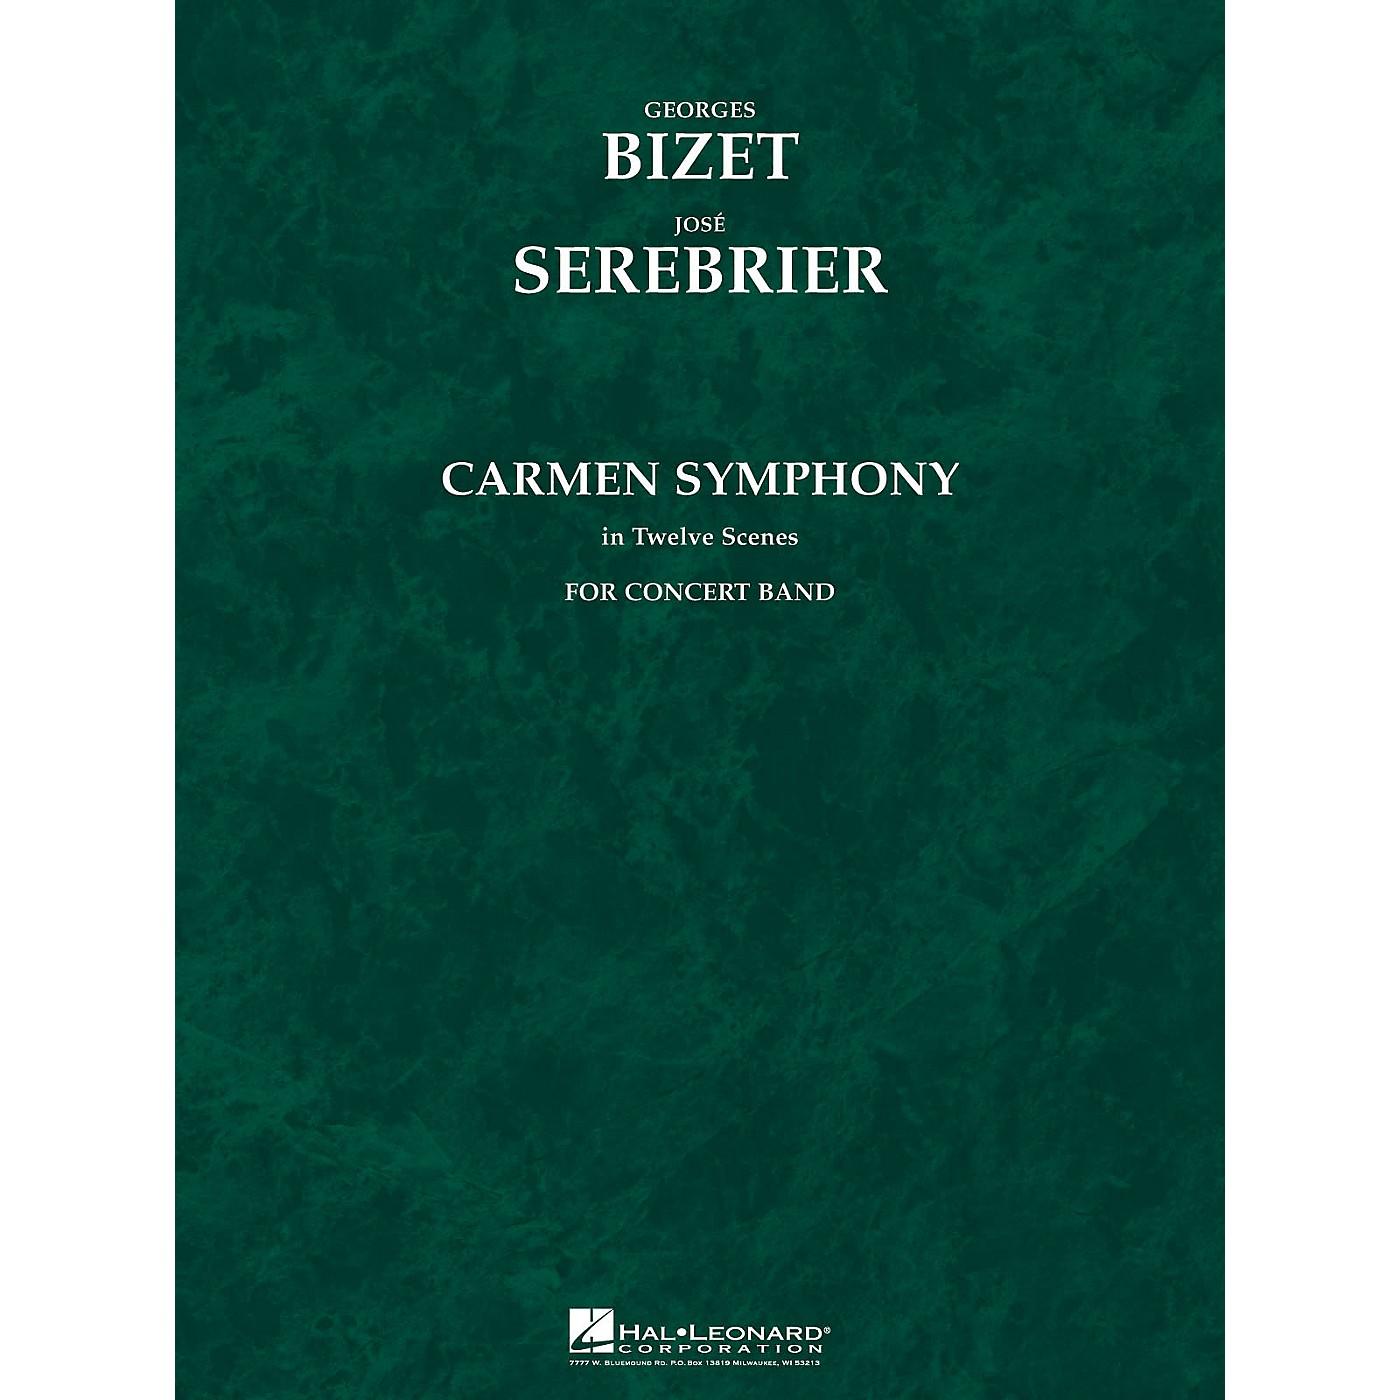 Hal Leonard Carmen Symphony (Score and Parts) Concert Band Level 5 Arranged by Jose Serebrier thumbnail